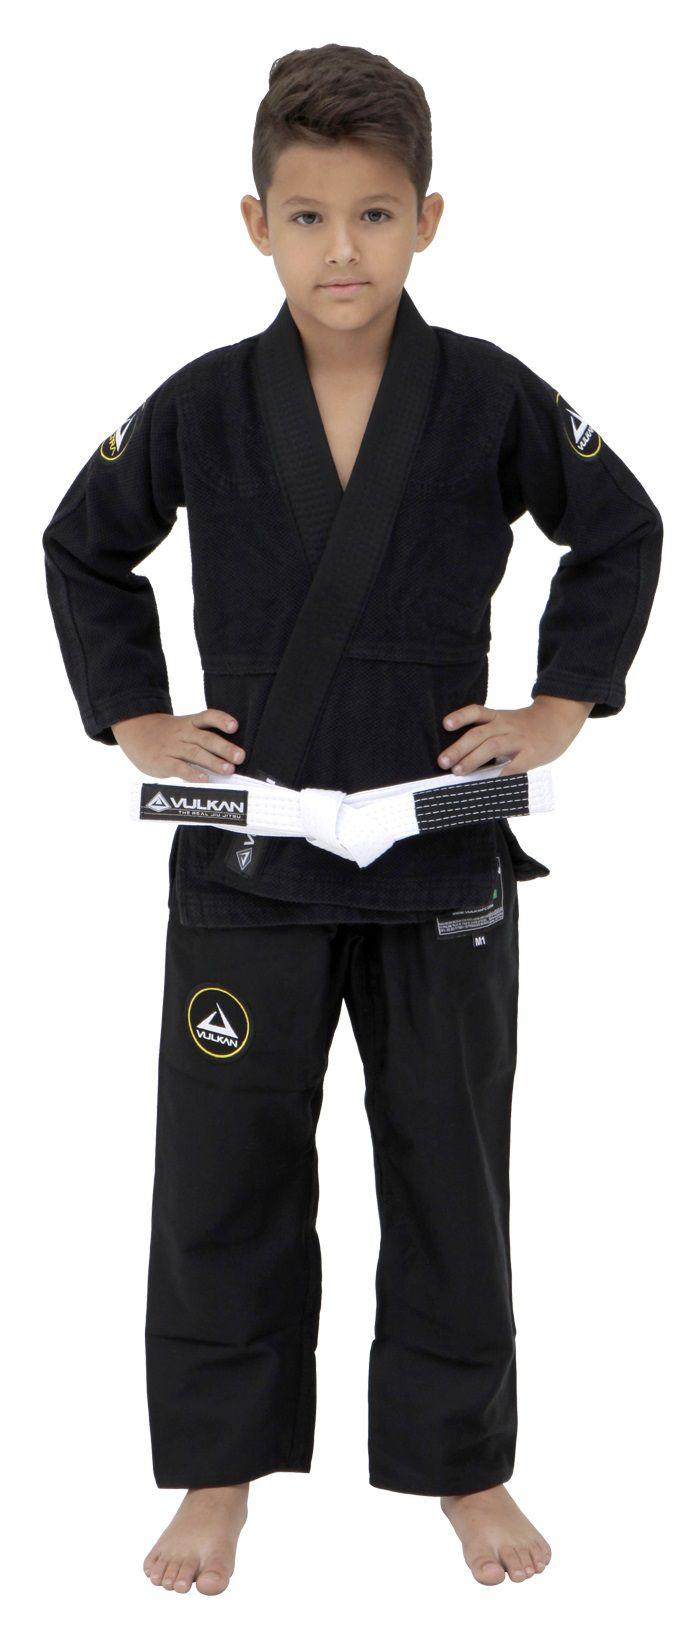 901847c239ae6 Kimono Vulkan Para Jiu-jitsu Profissional Infantil - NEO ULTRA LIGHT PRETO